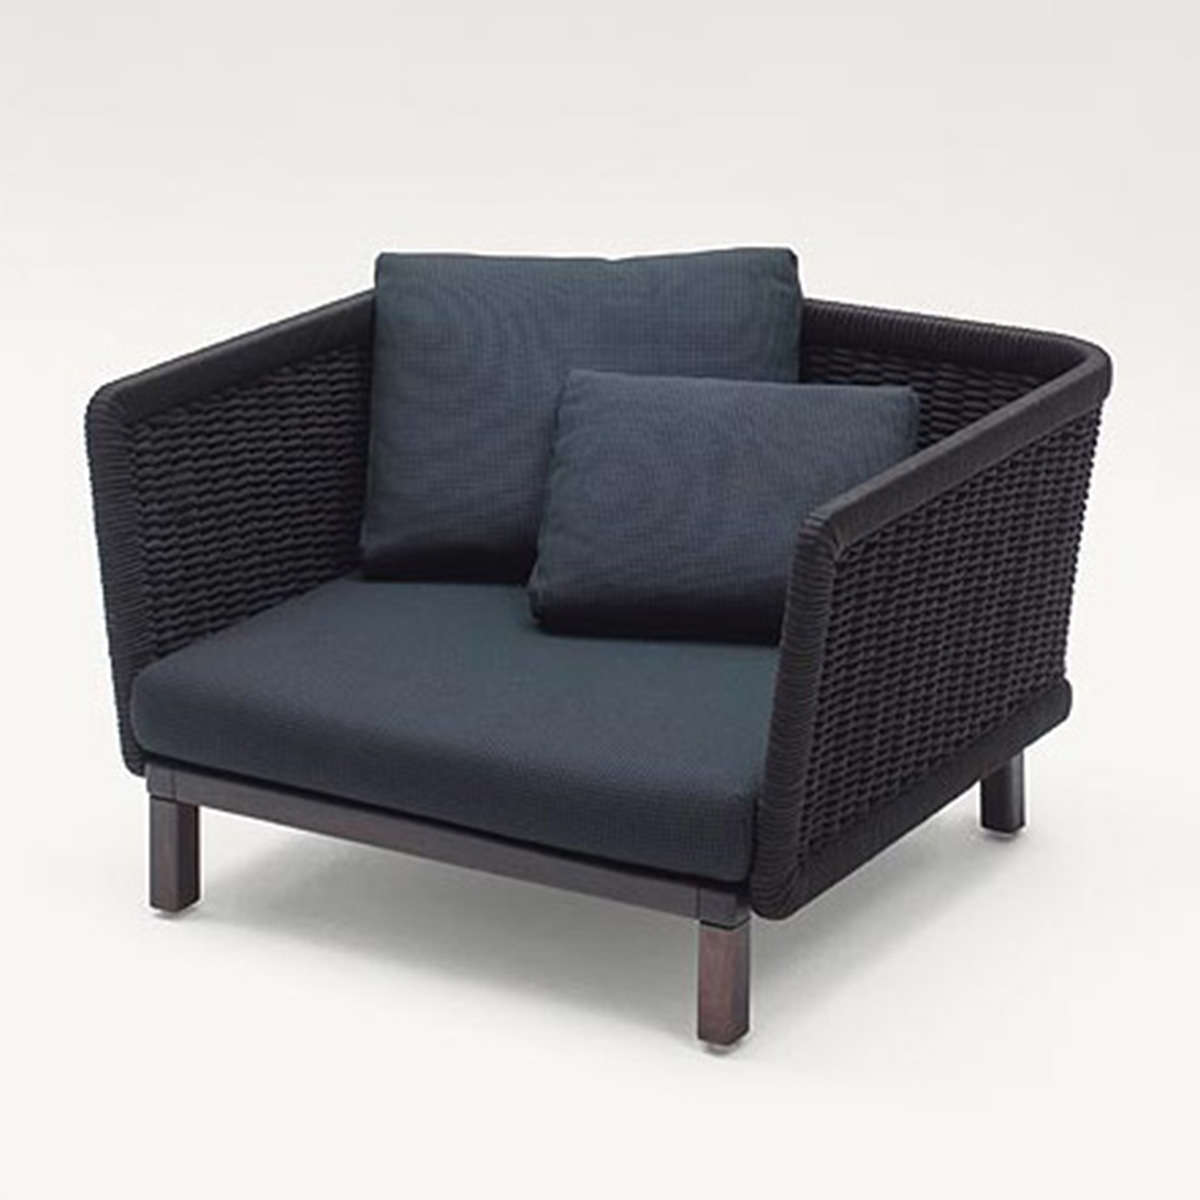 Sabi Lounge chair